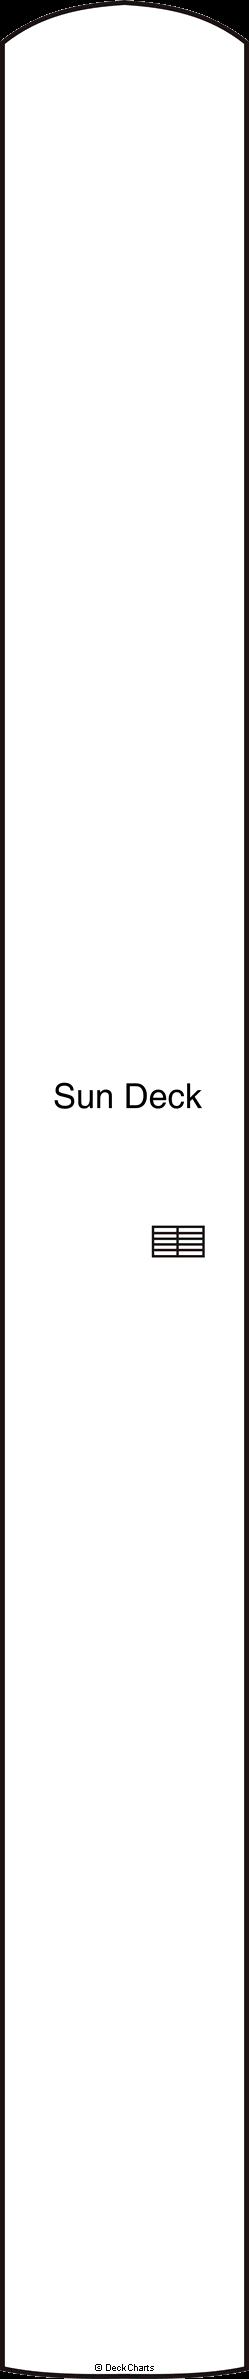 Viking Legend: Sun Deck